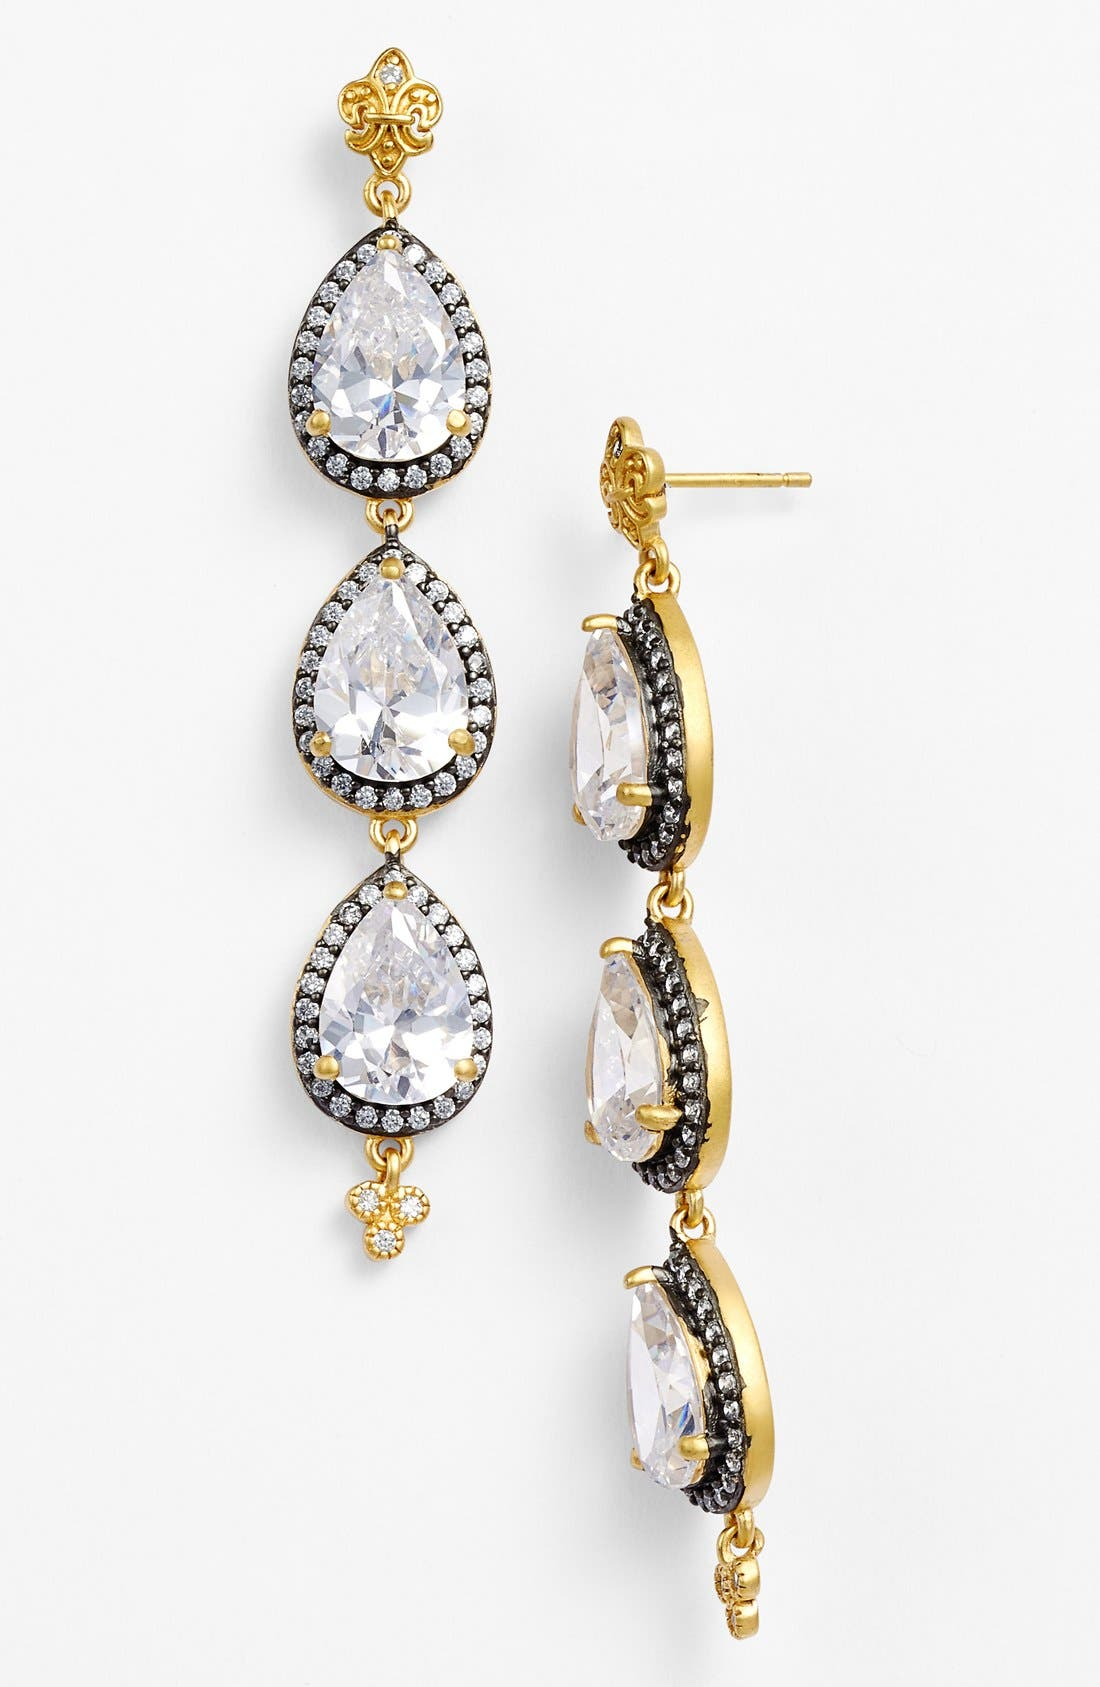 Alternate Image 1 Selected - FREIDA ROTHMAN 'Femme' Linear Earrings